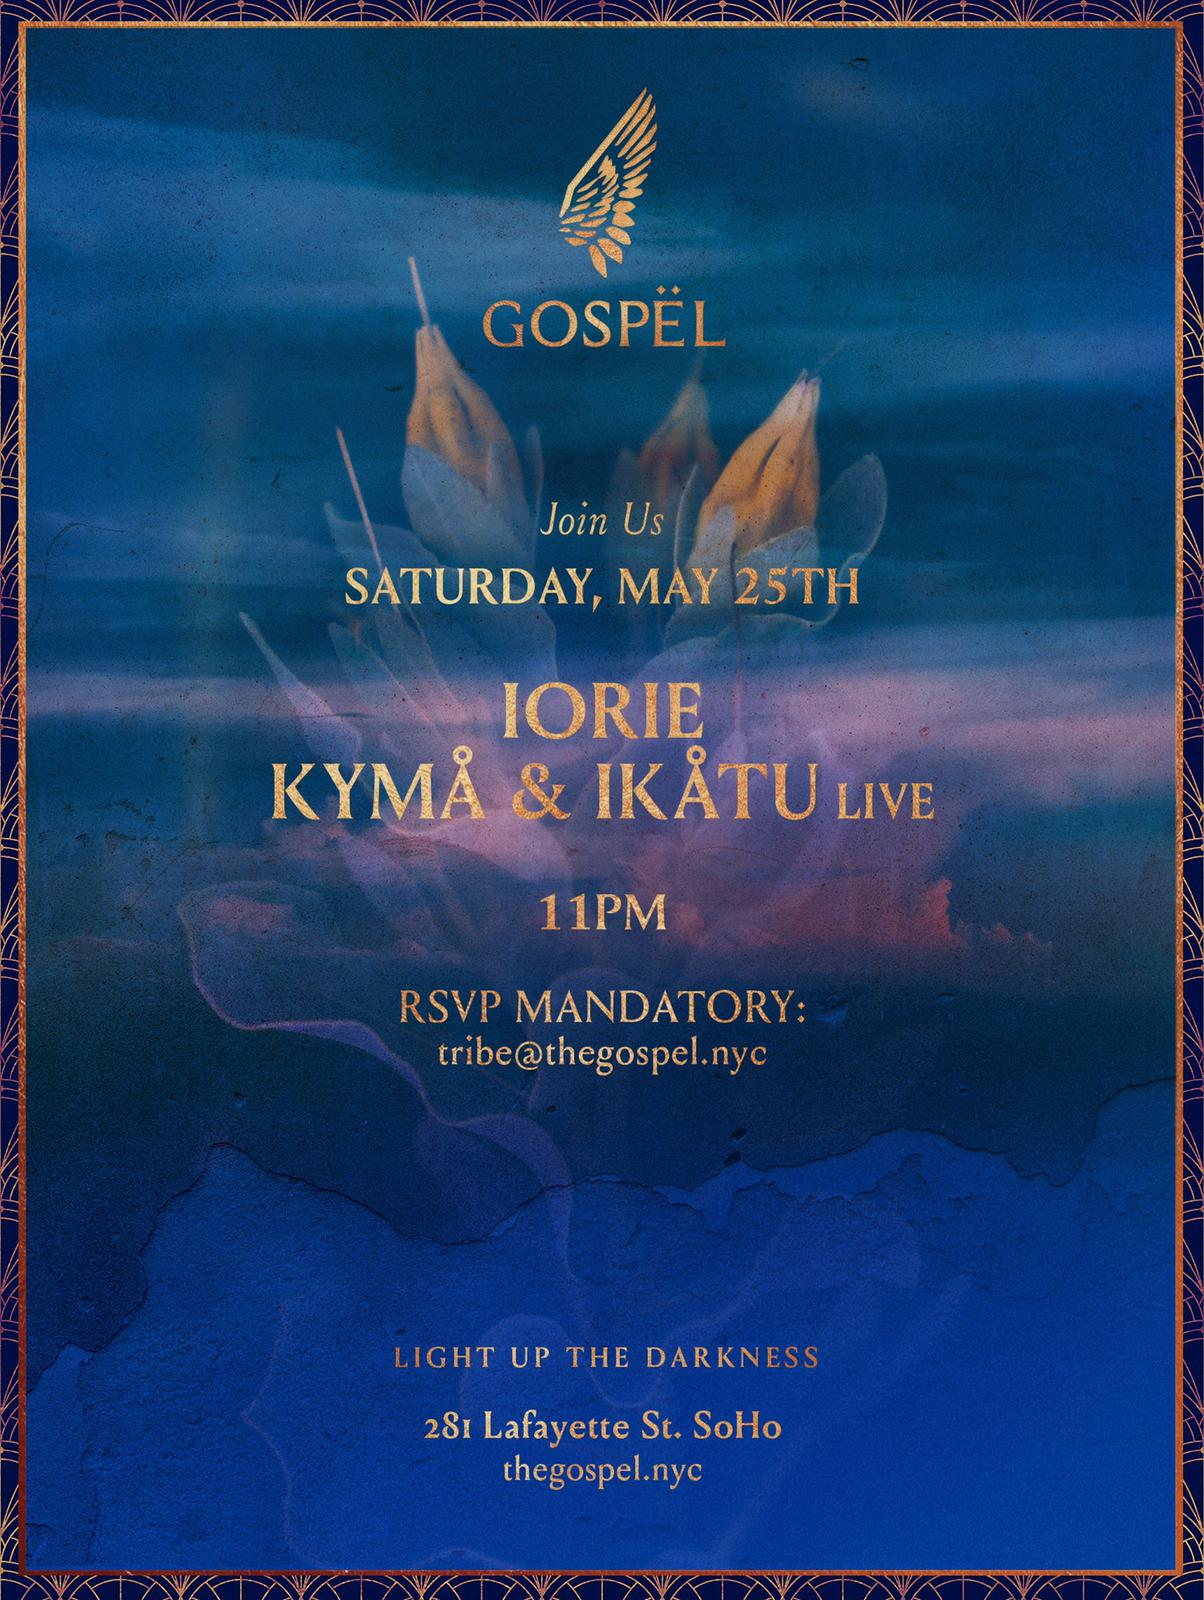 kyma & ikatu live at gospel soho